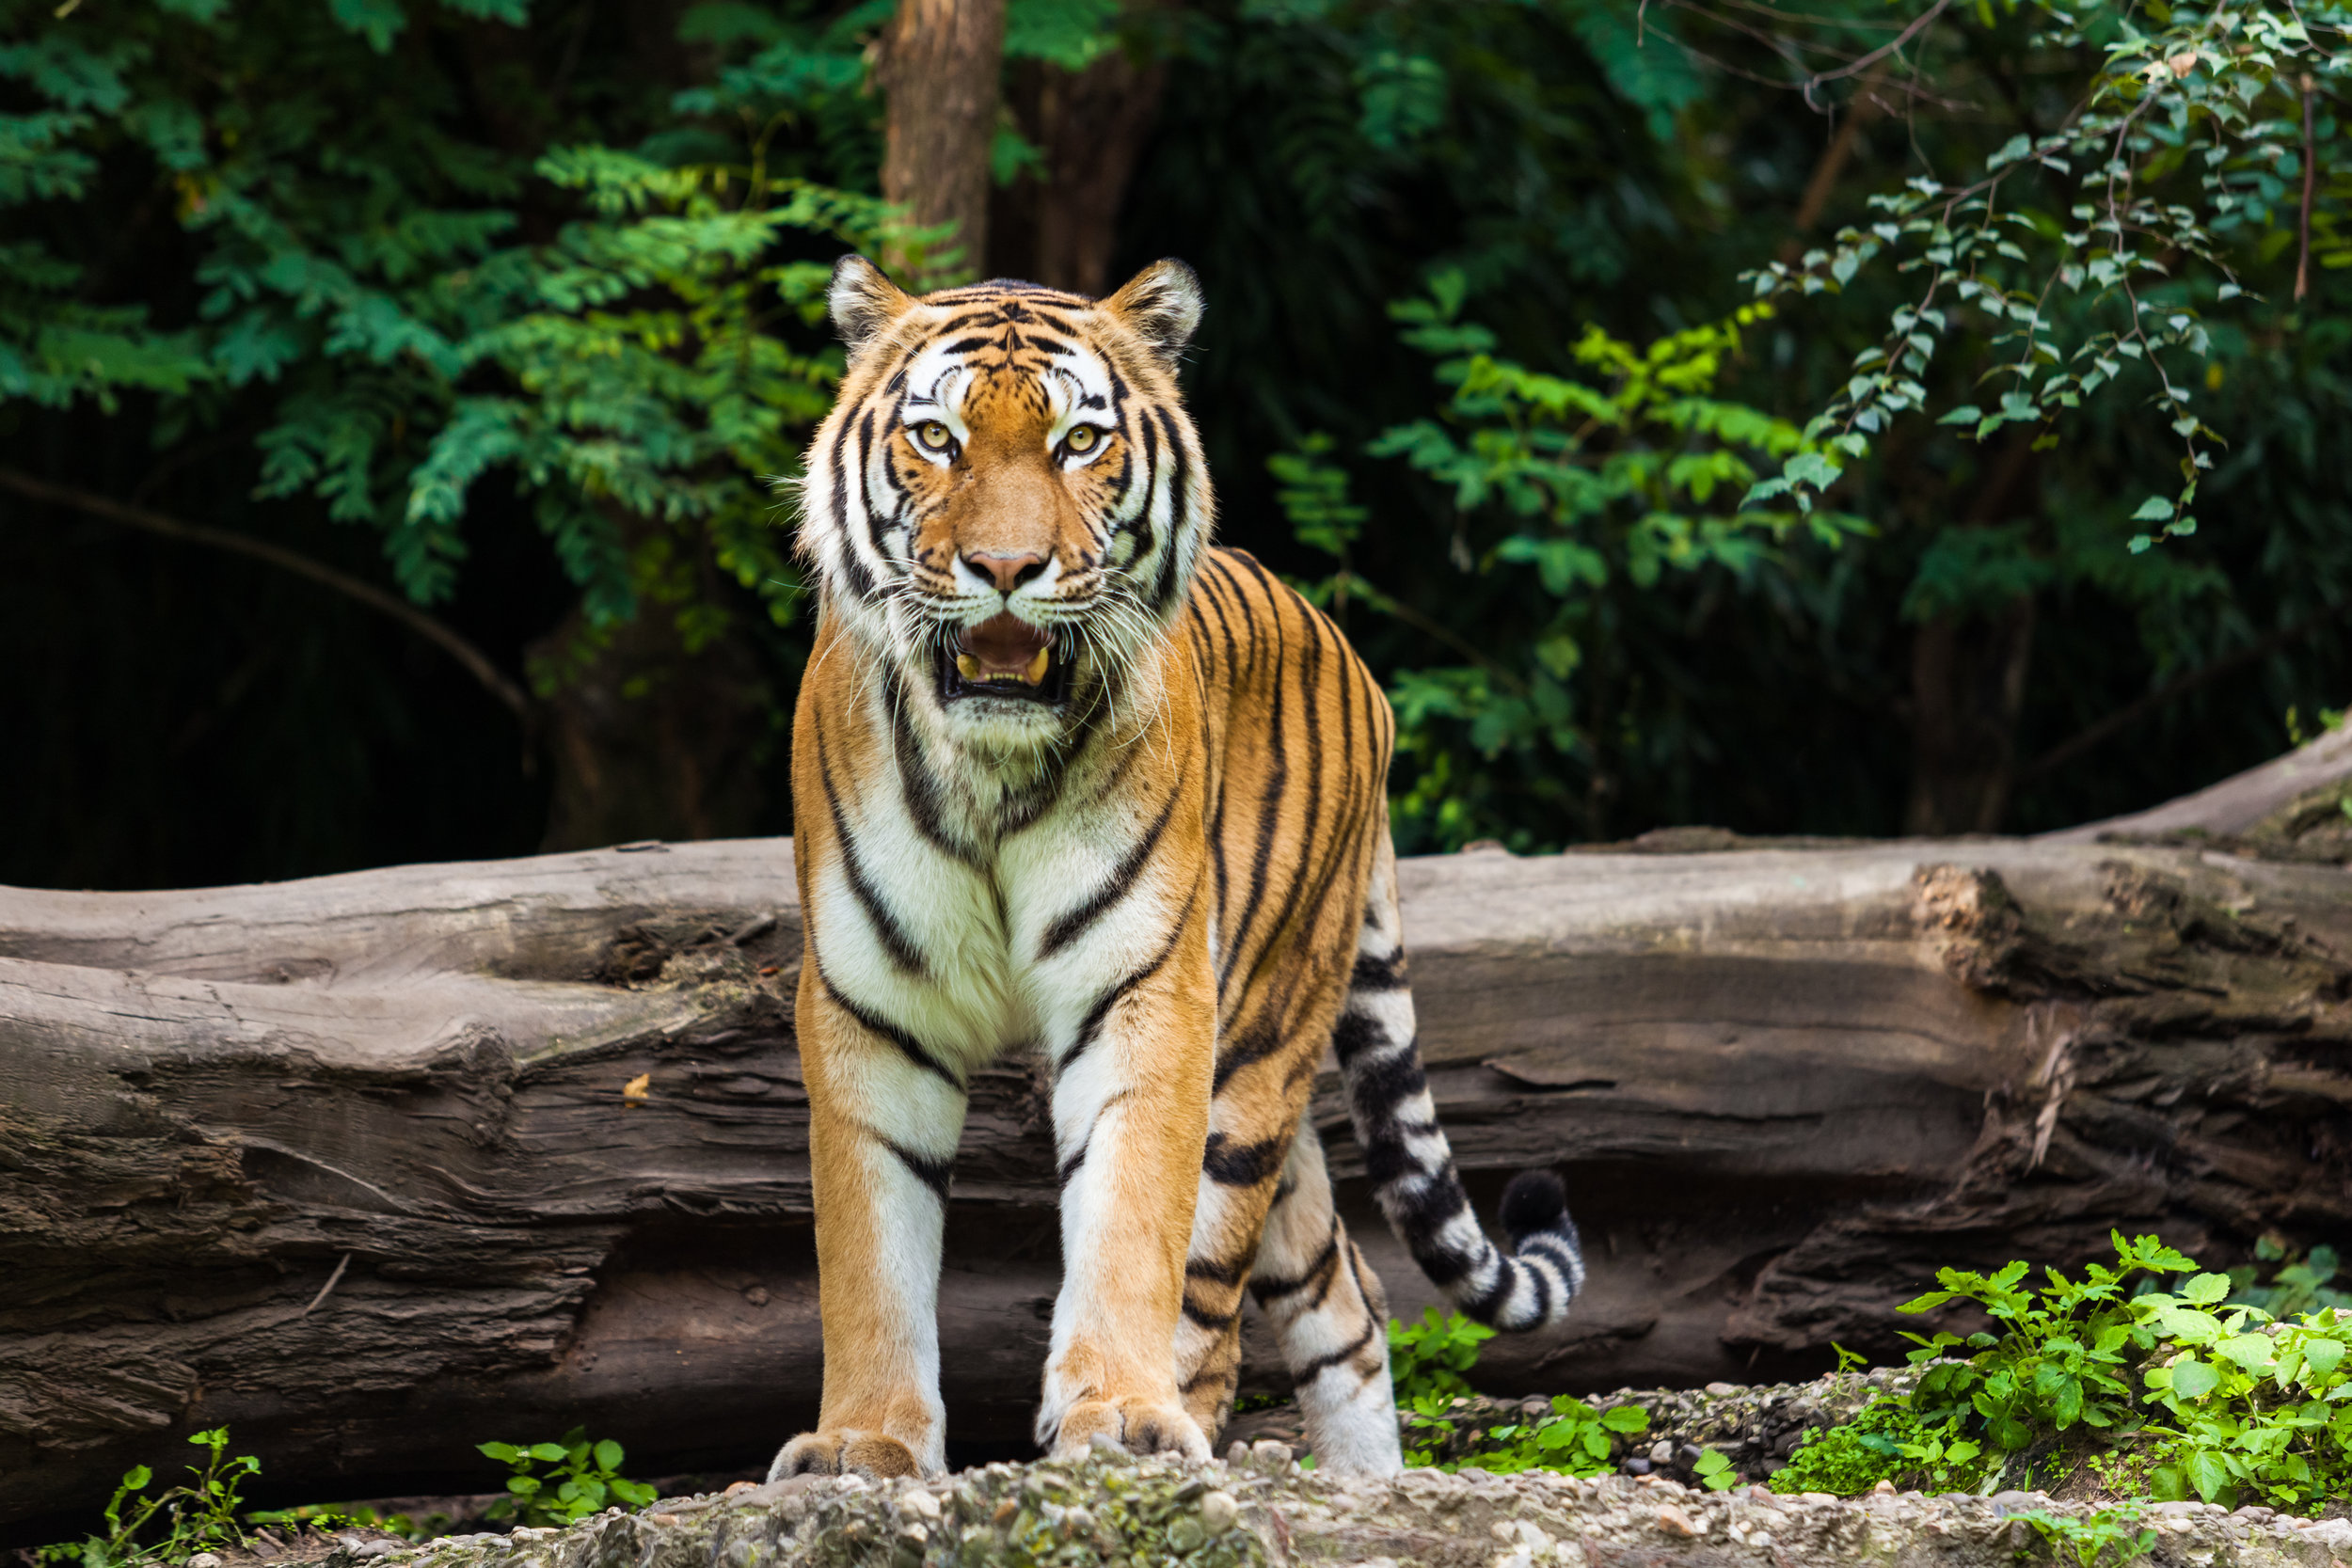 tiger image.jpg